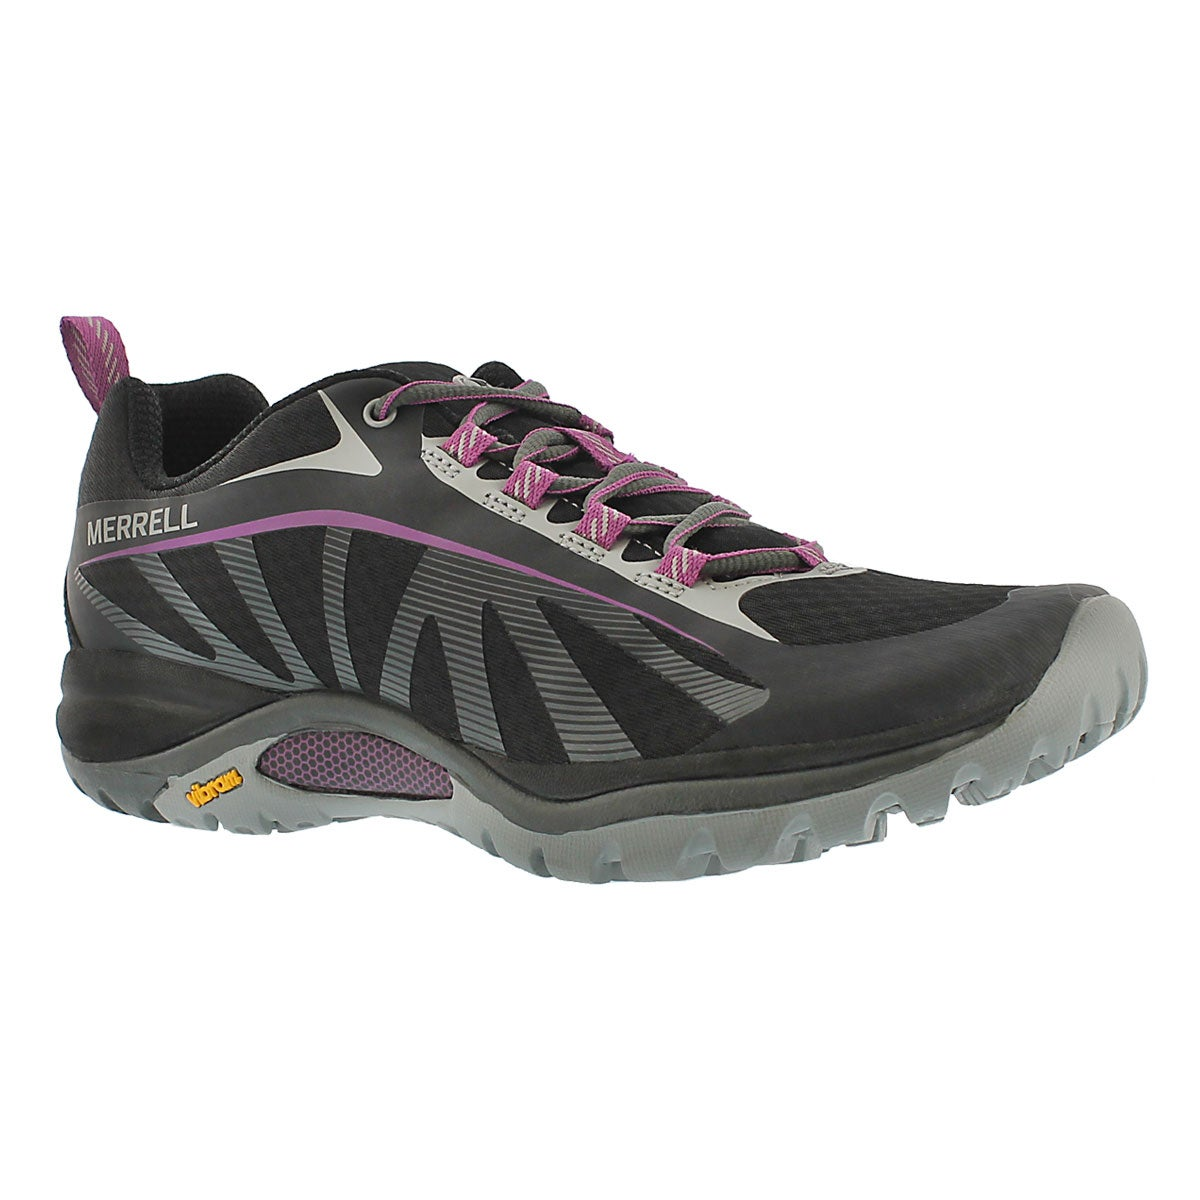 Lds Siren Edge blk/purple hiking shoe